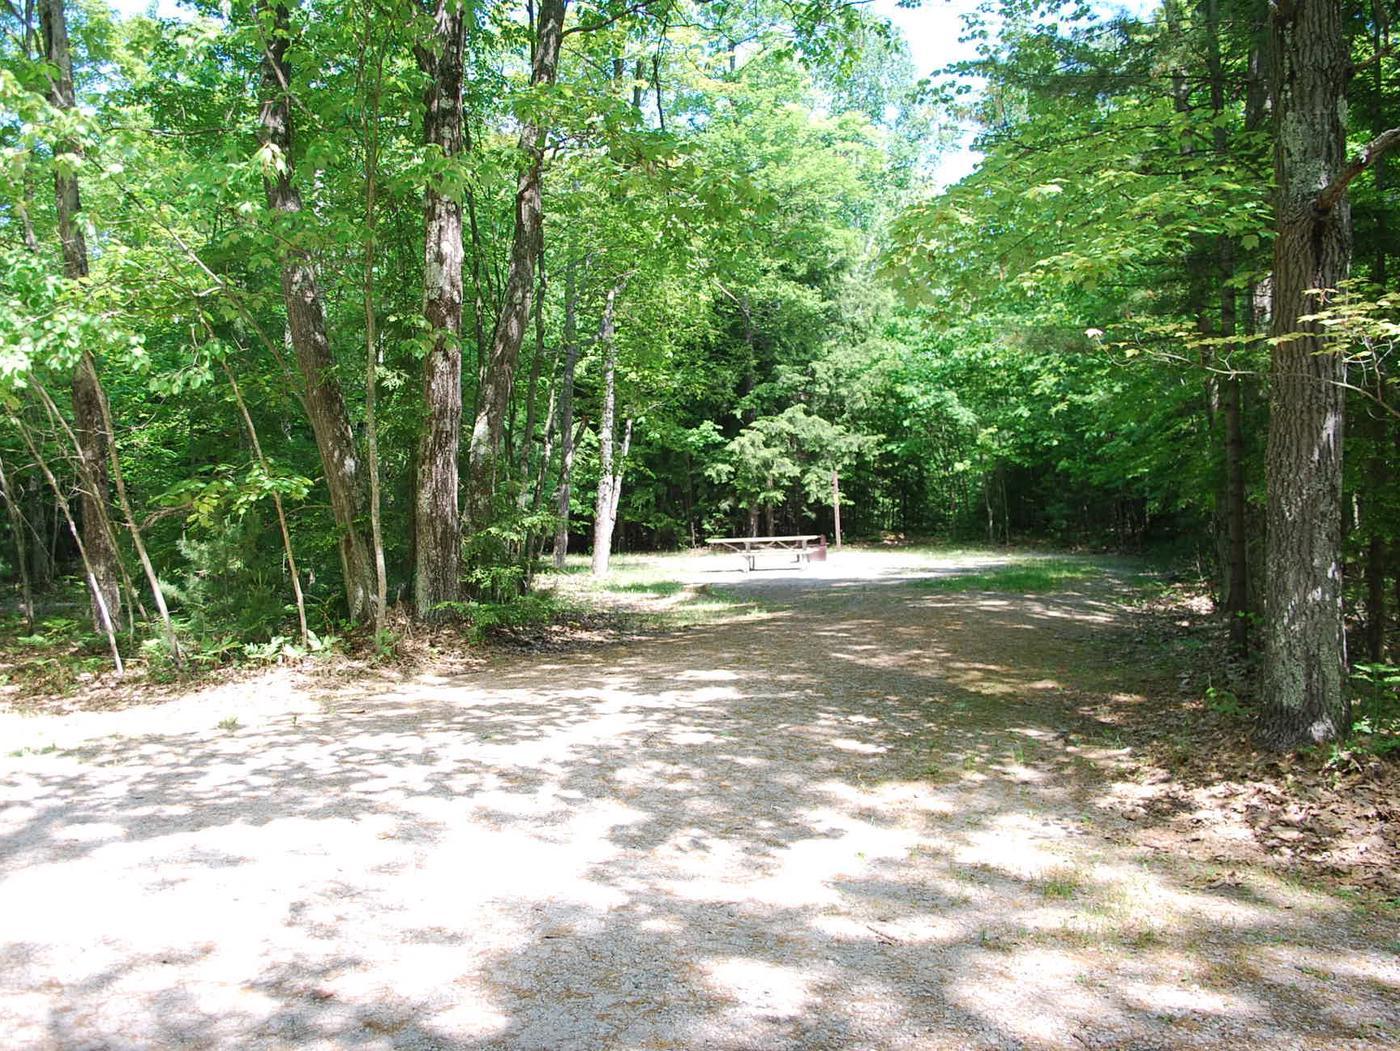 Little Bay de Noc Campground site #28